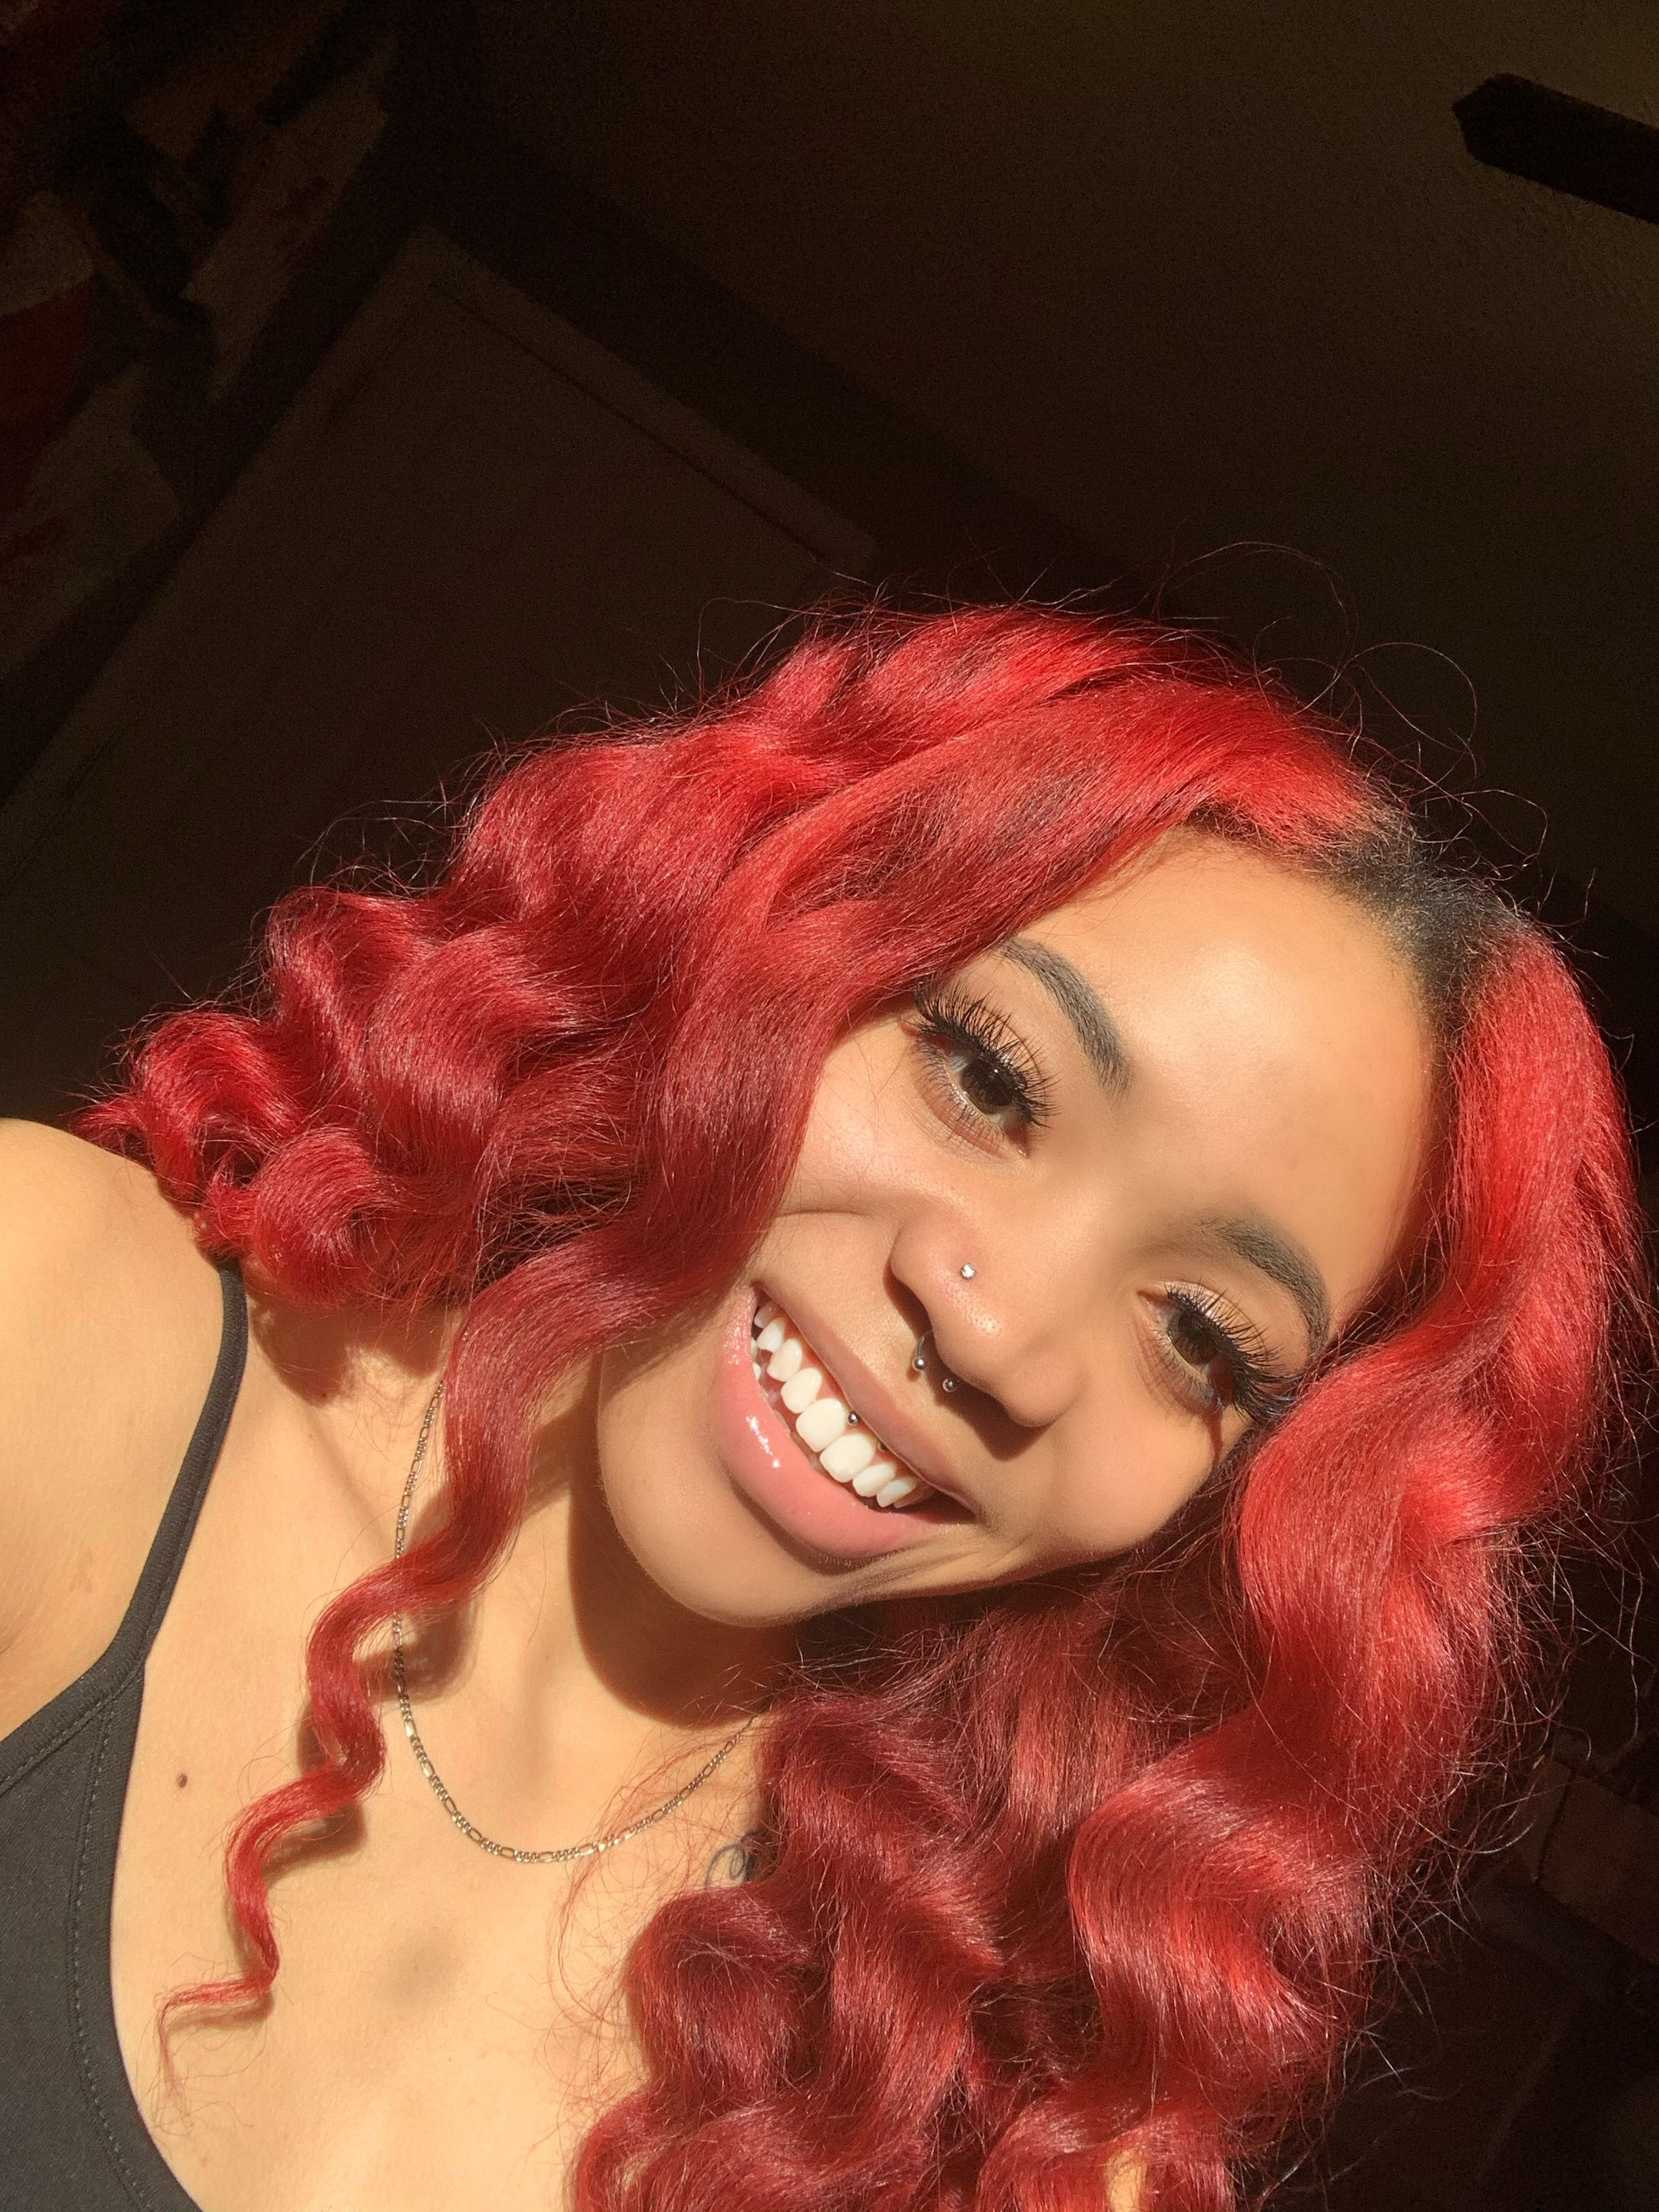 #wandcurls #adorehaircolor #redhair #naturalhairstyles #naturalbeauty #septumpiercing  #smileypiercing